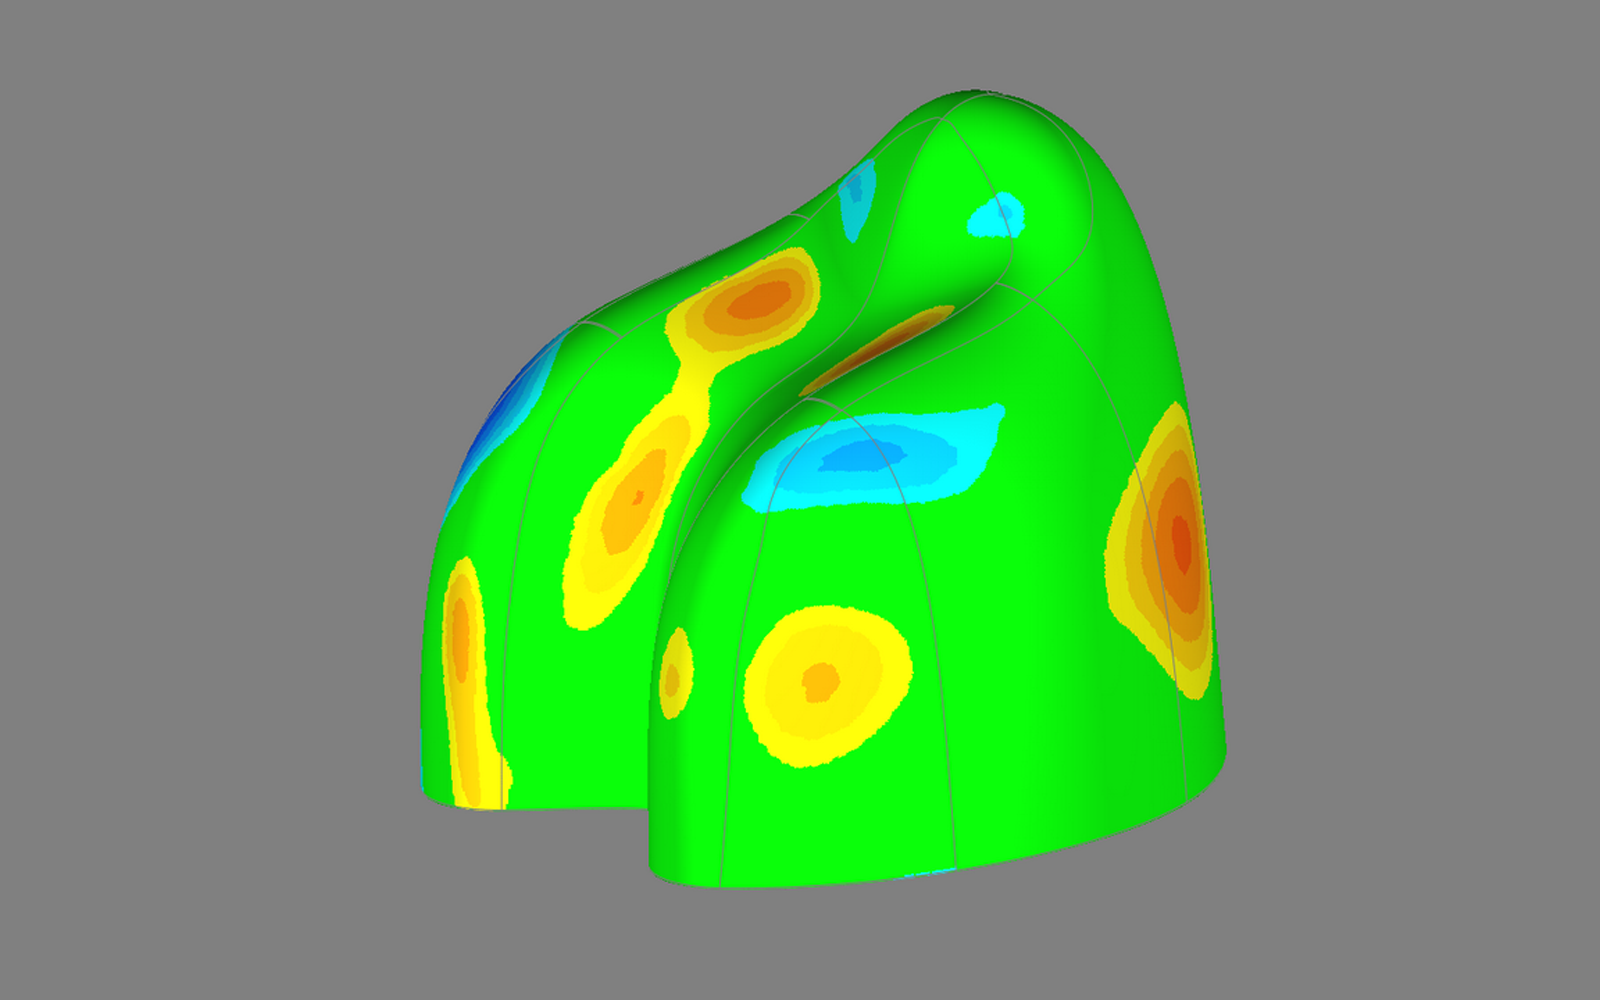 Conap CAD Konstruktionsbüro - CAD Modell eines Bauteils